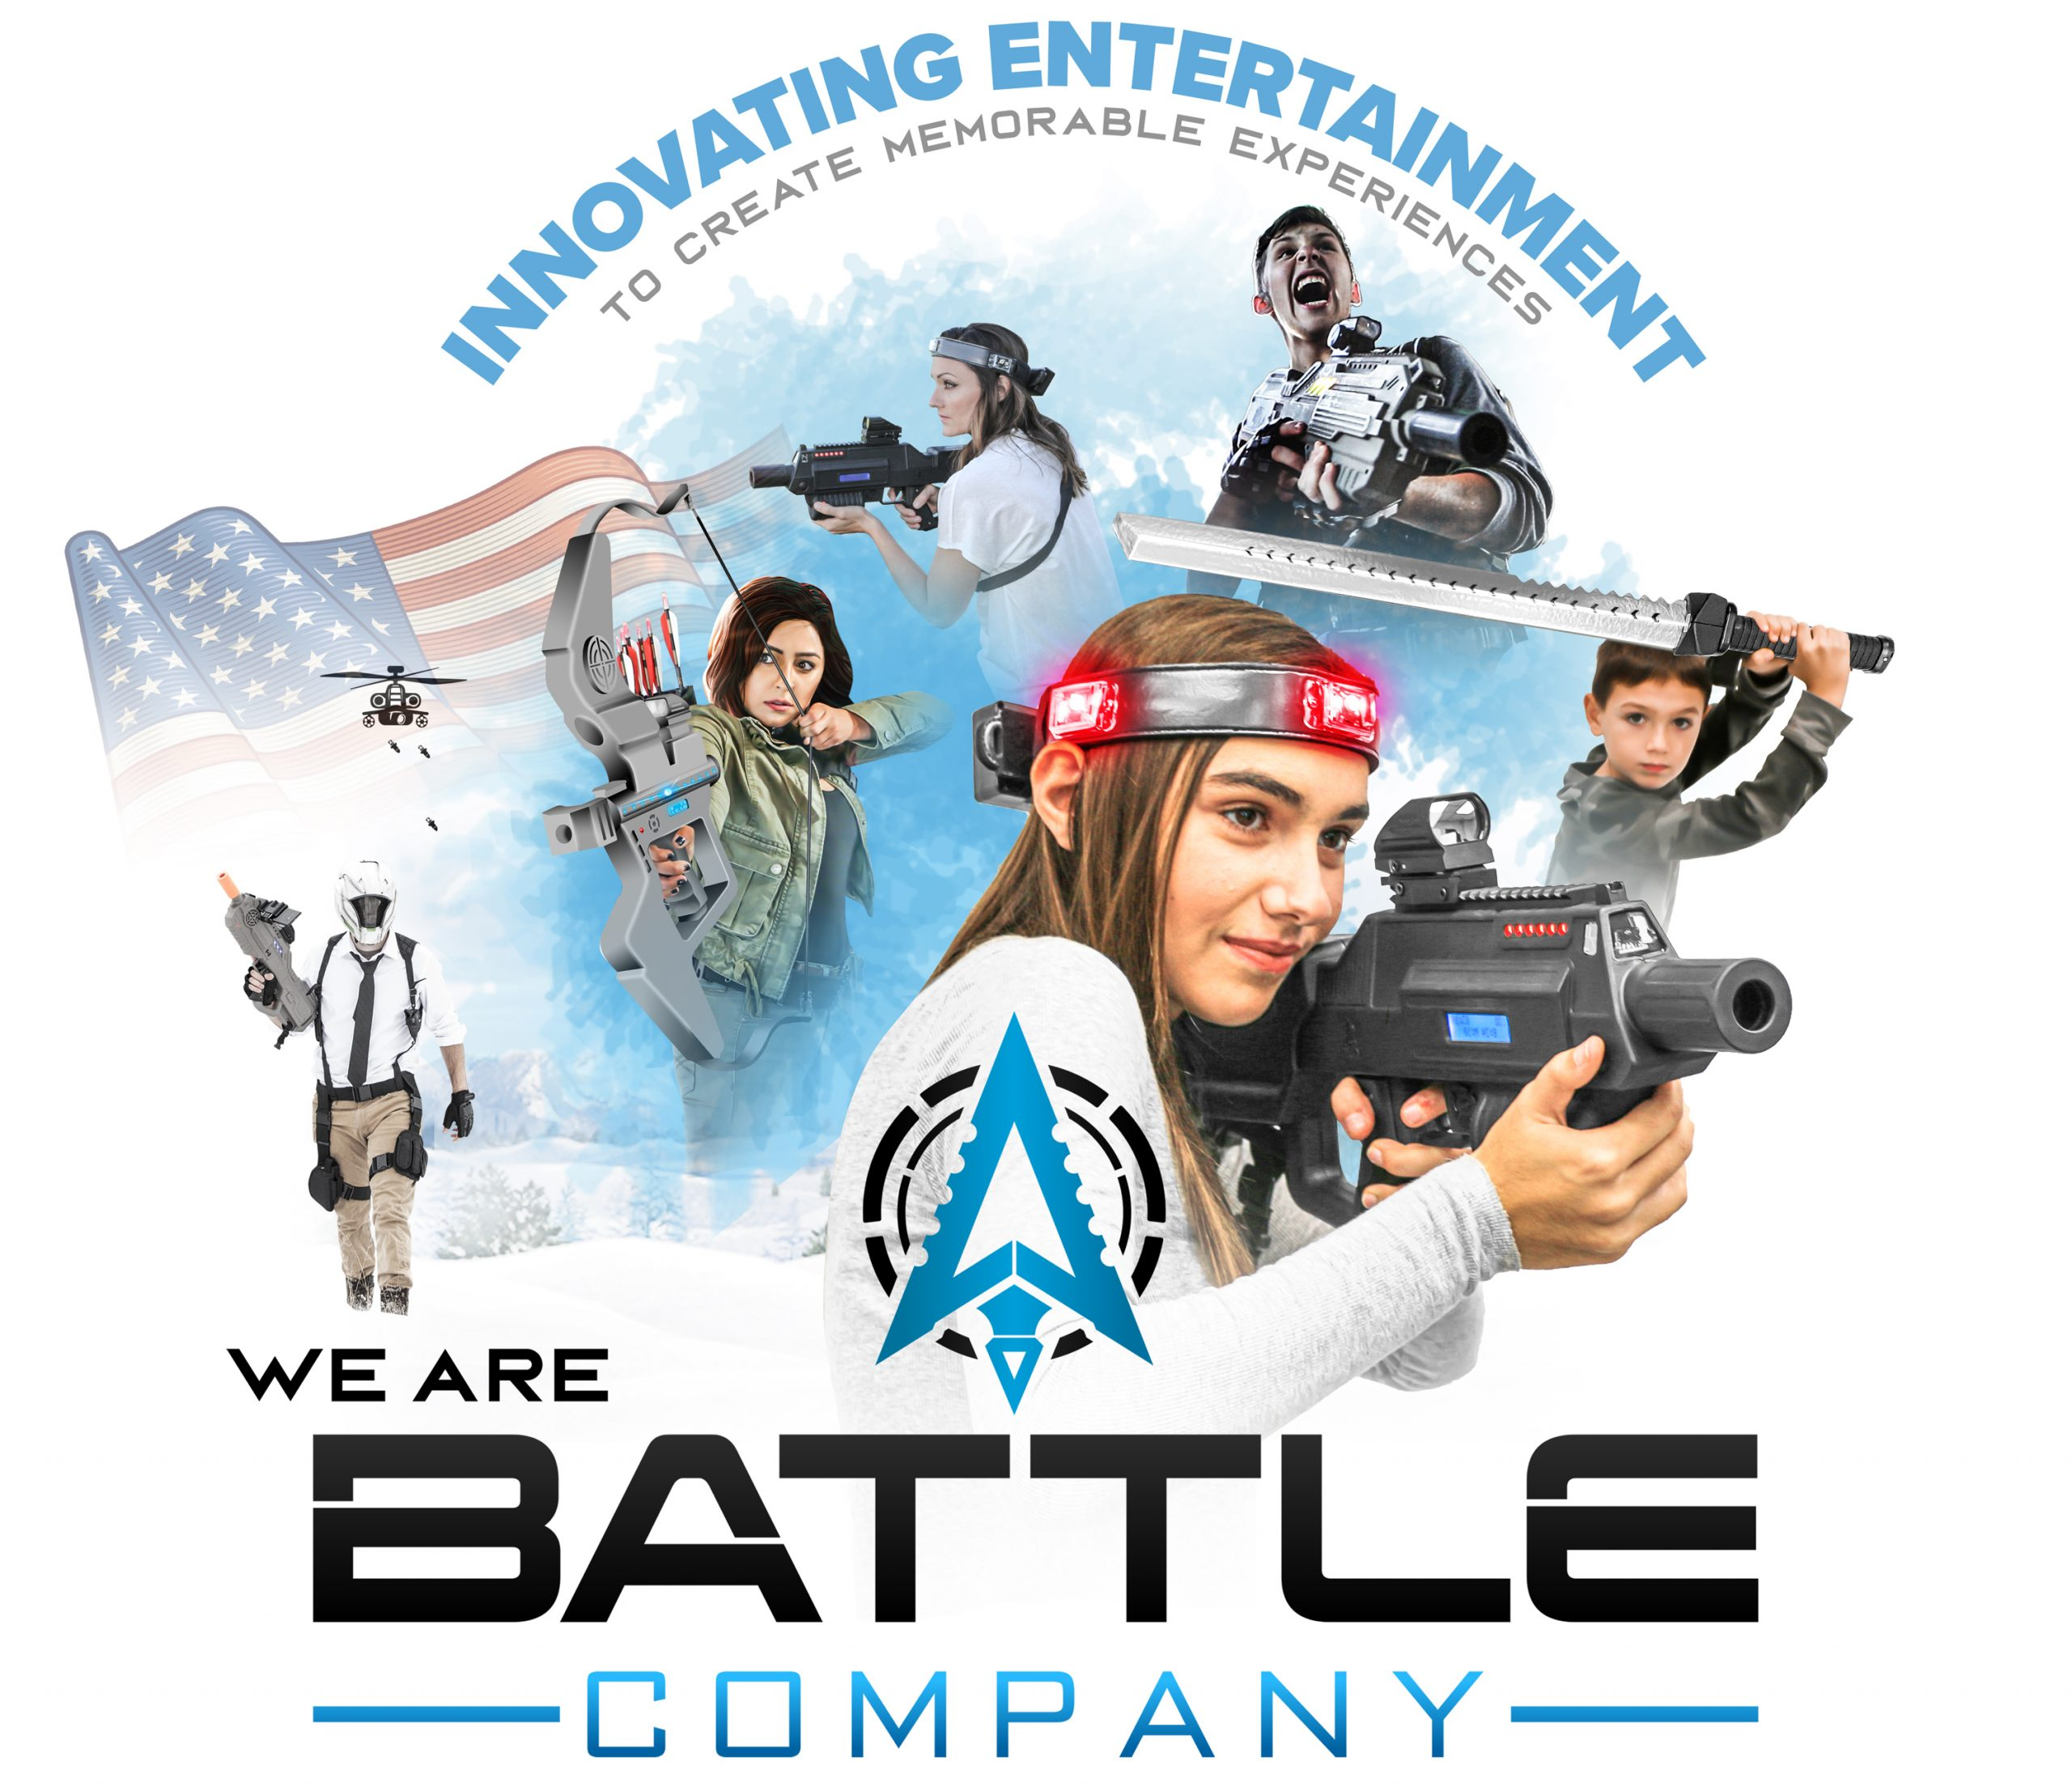 battle company laser tag